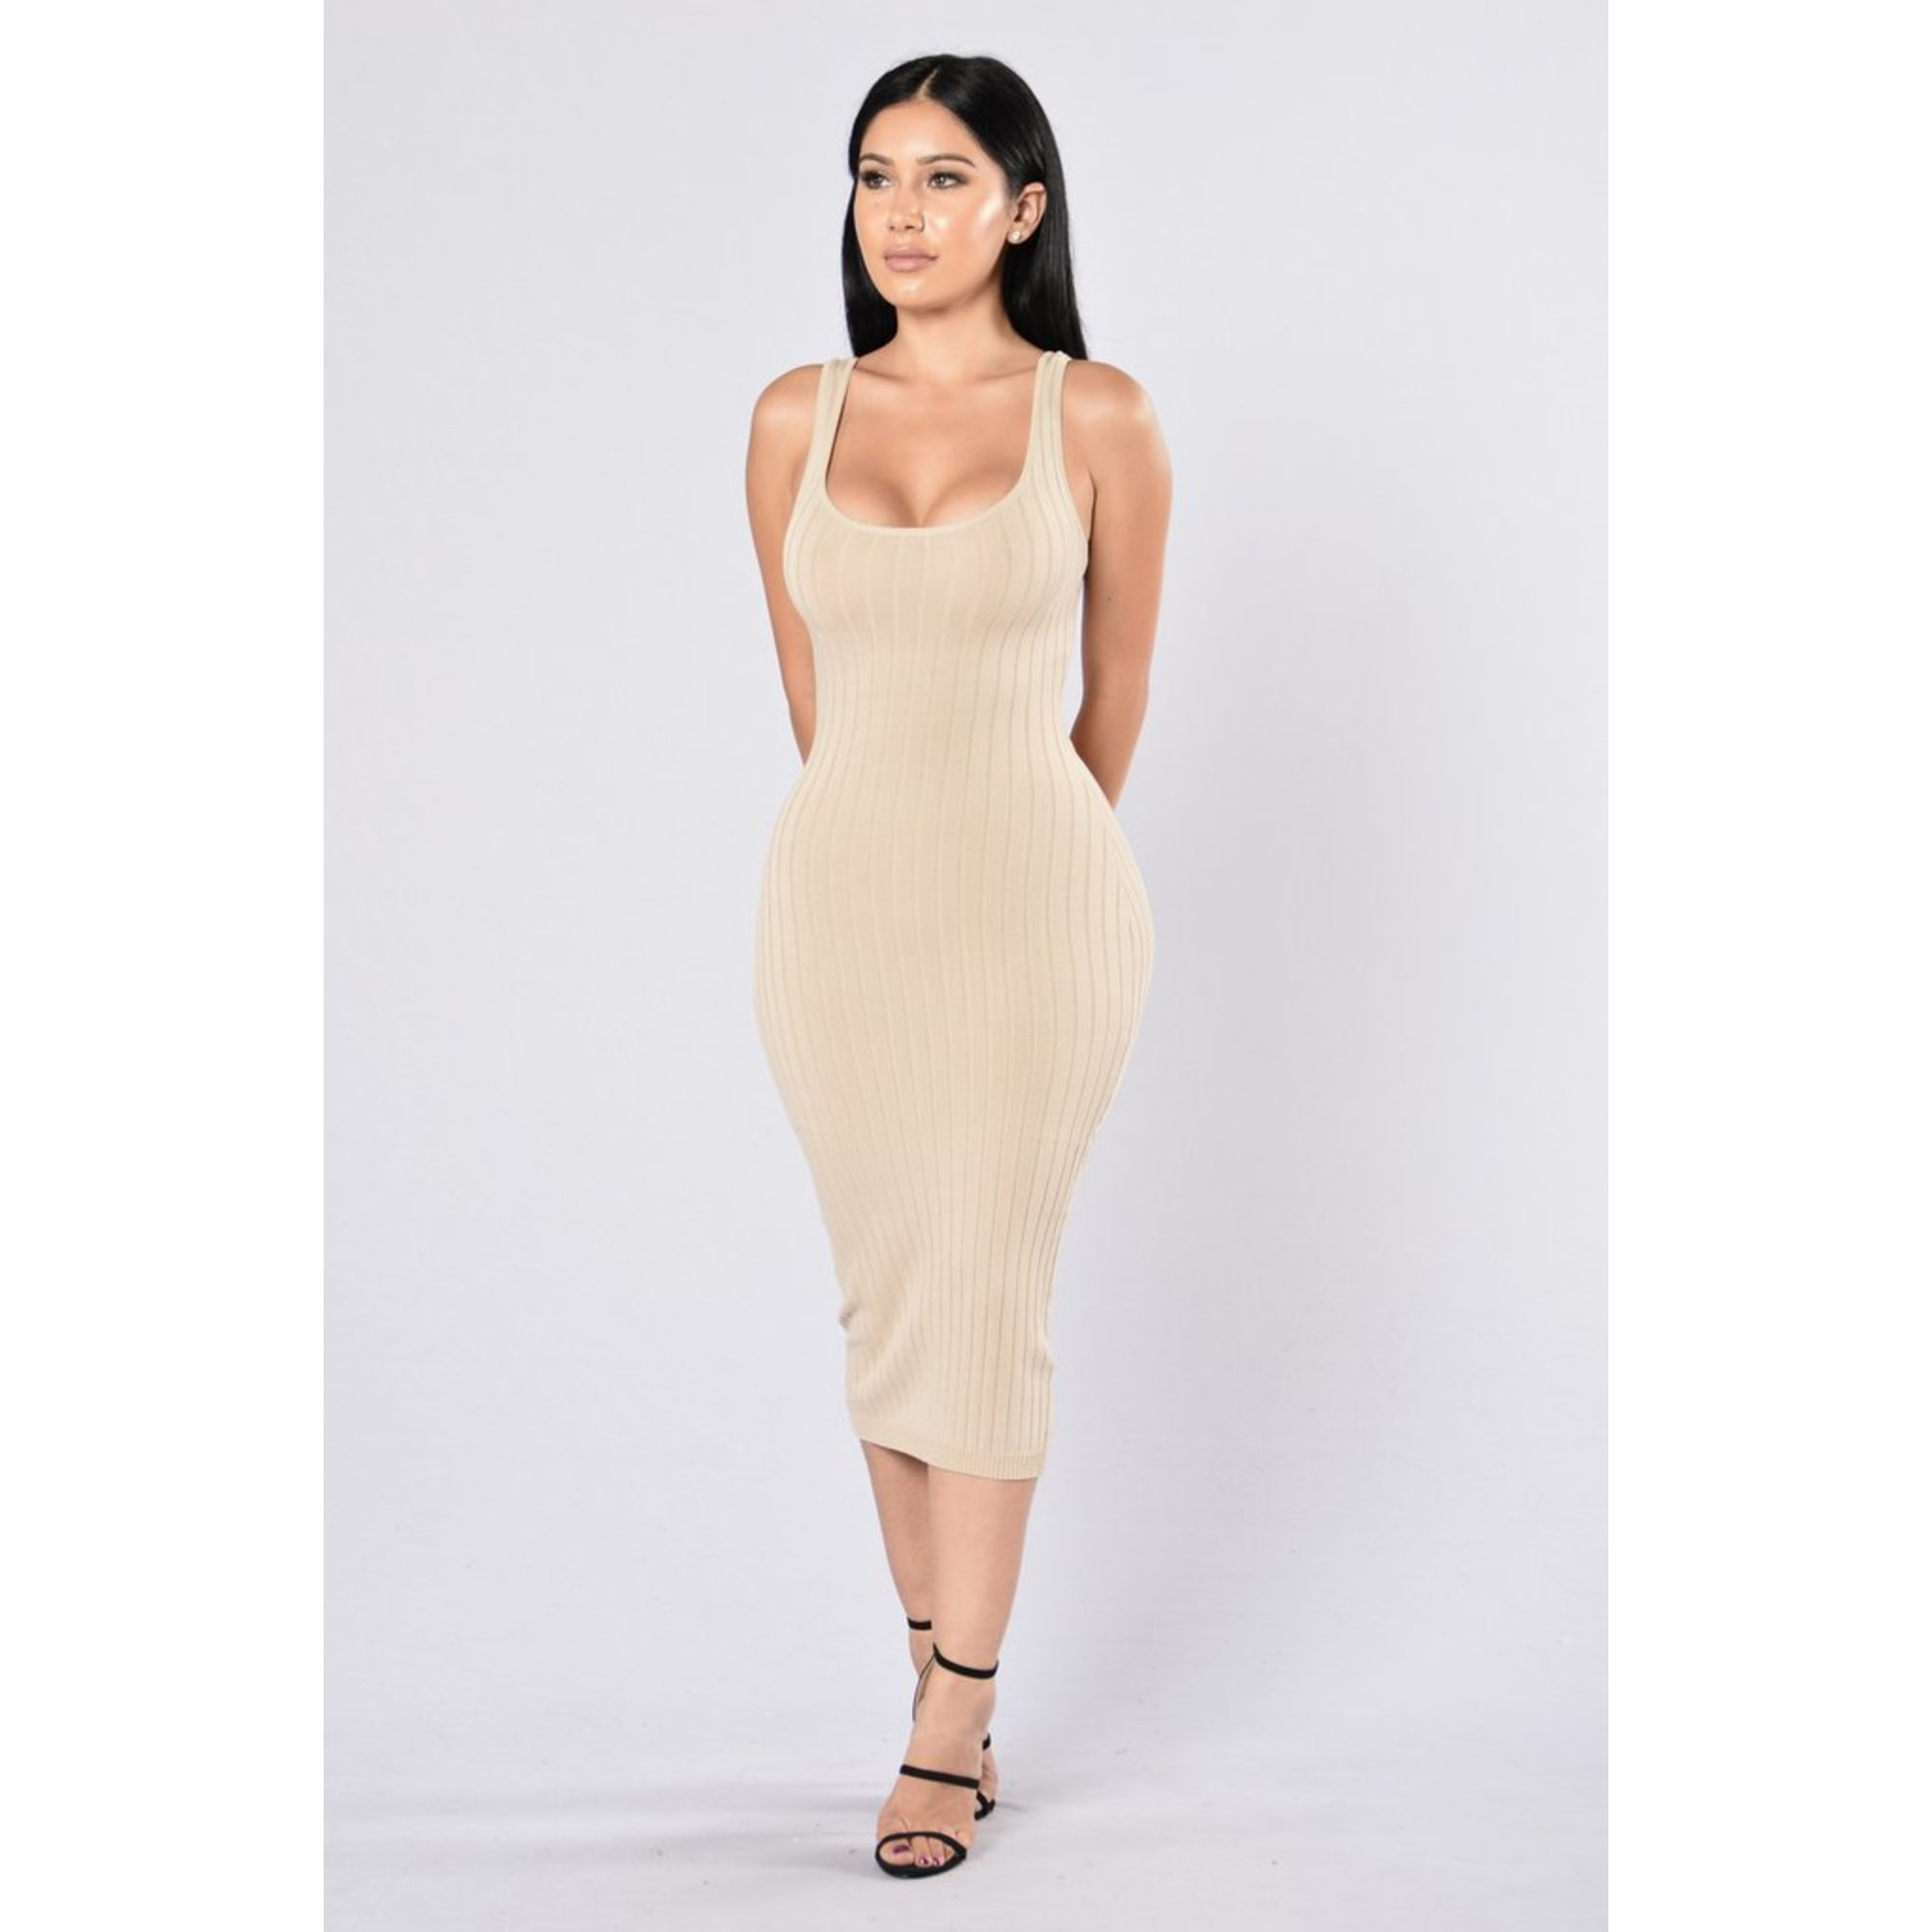 Fashion Nova Beauty Queen Maxi Dress: Maxi Dress FASHION NOVA 36 (S, T1) Beige